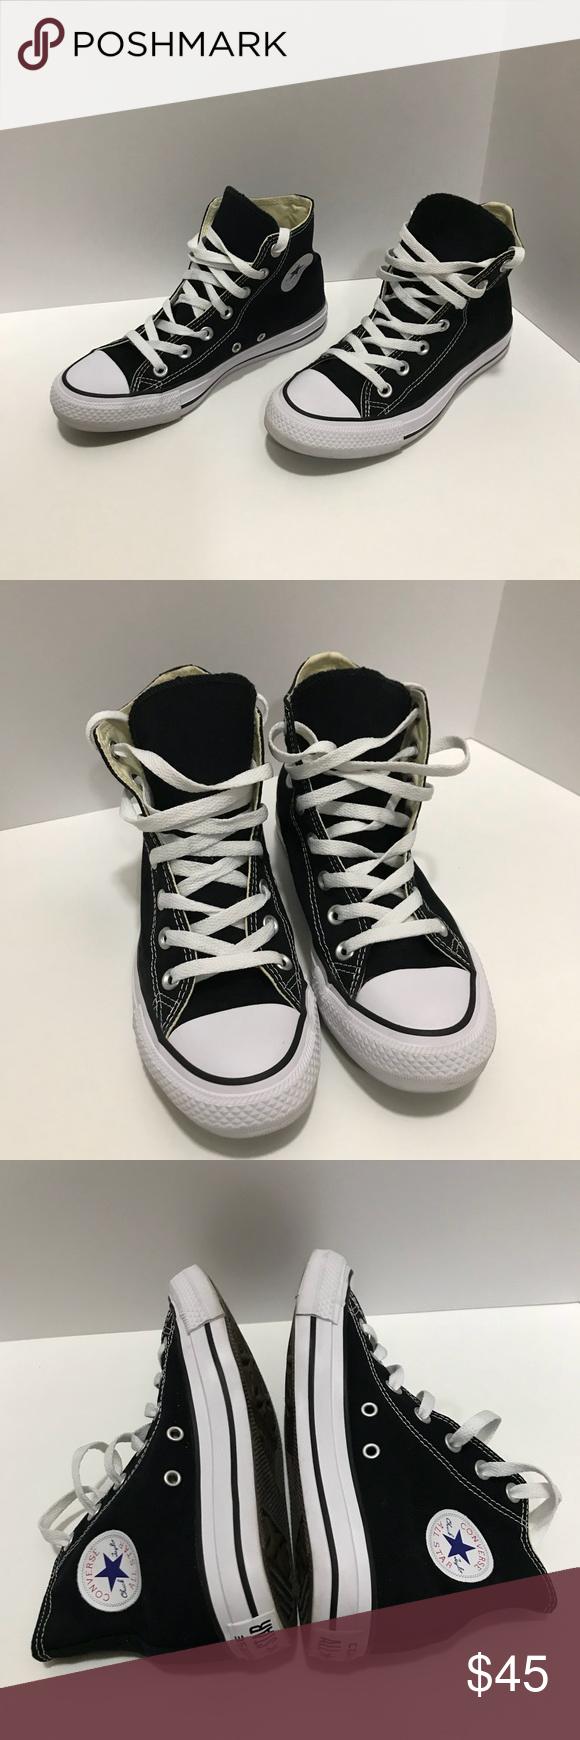 da7b30e9c306 Black Converse high tops size 4 mens